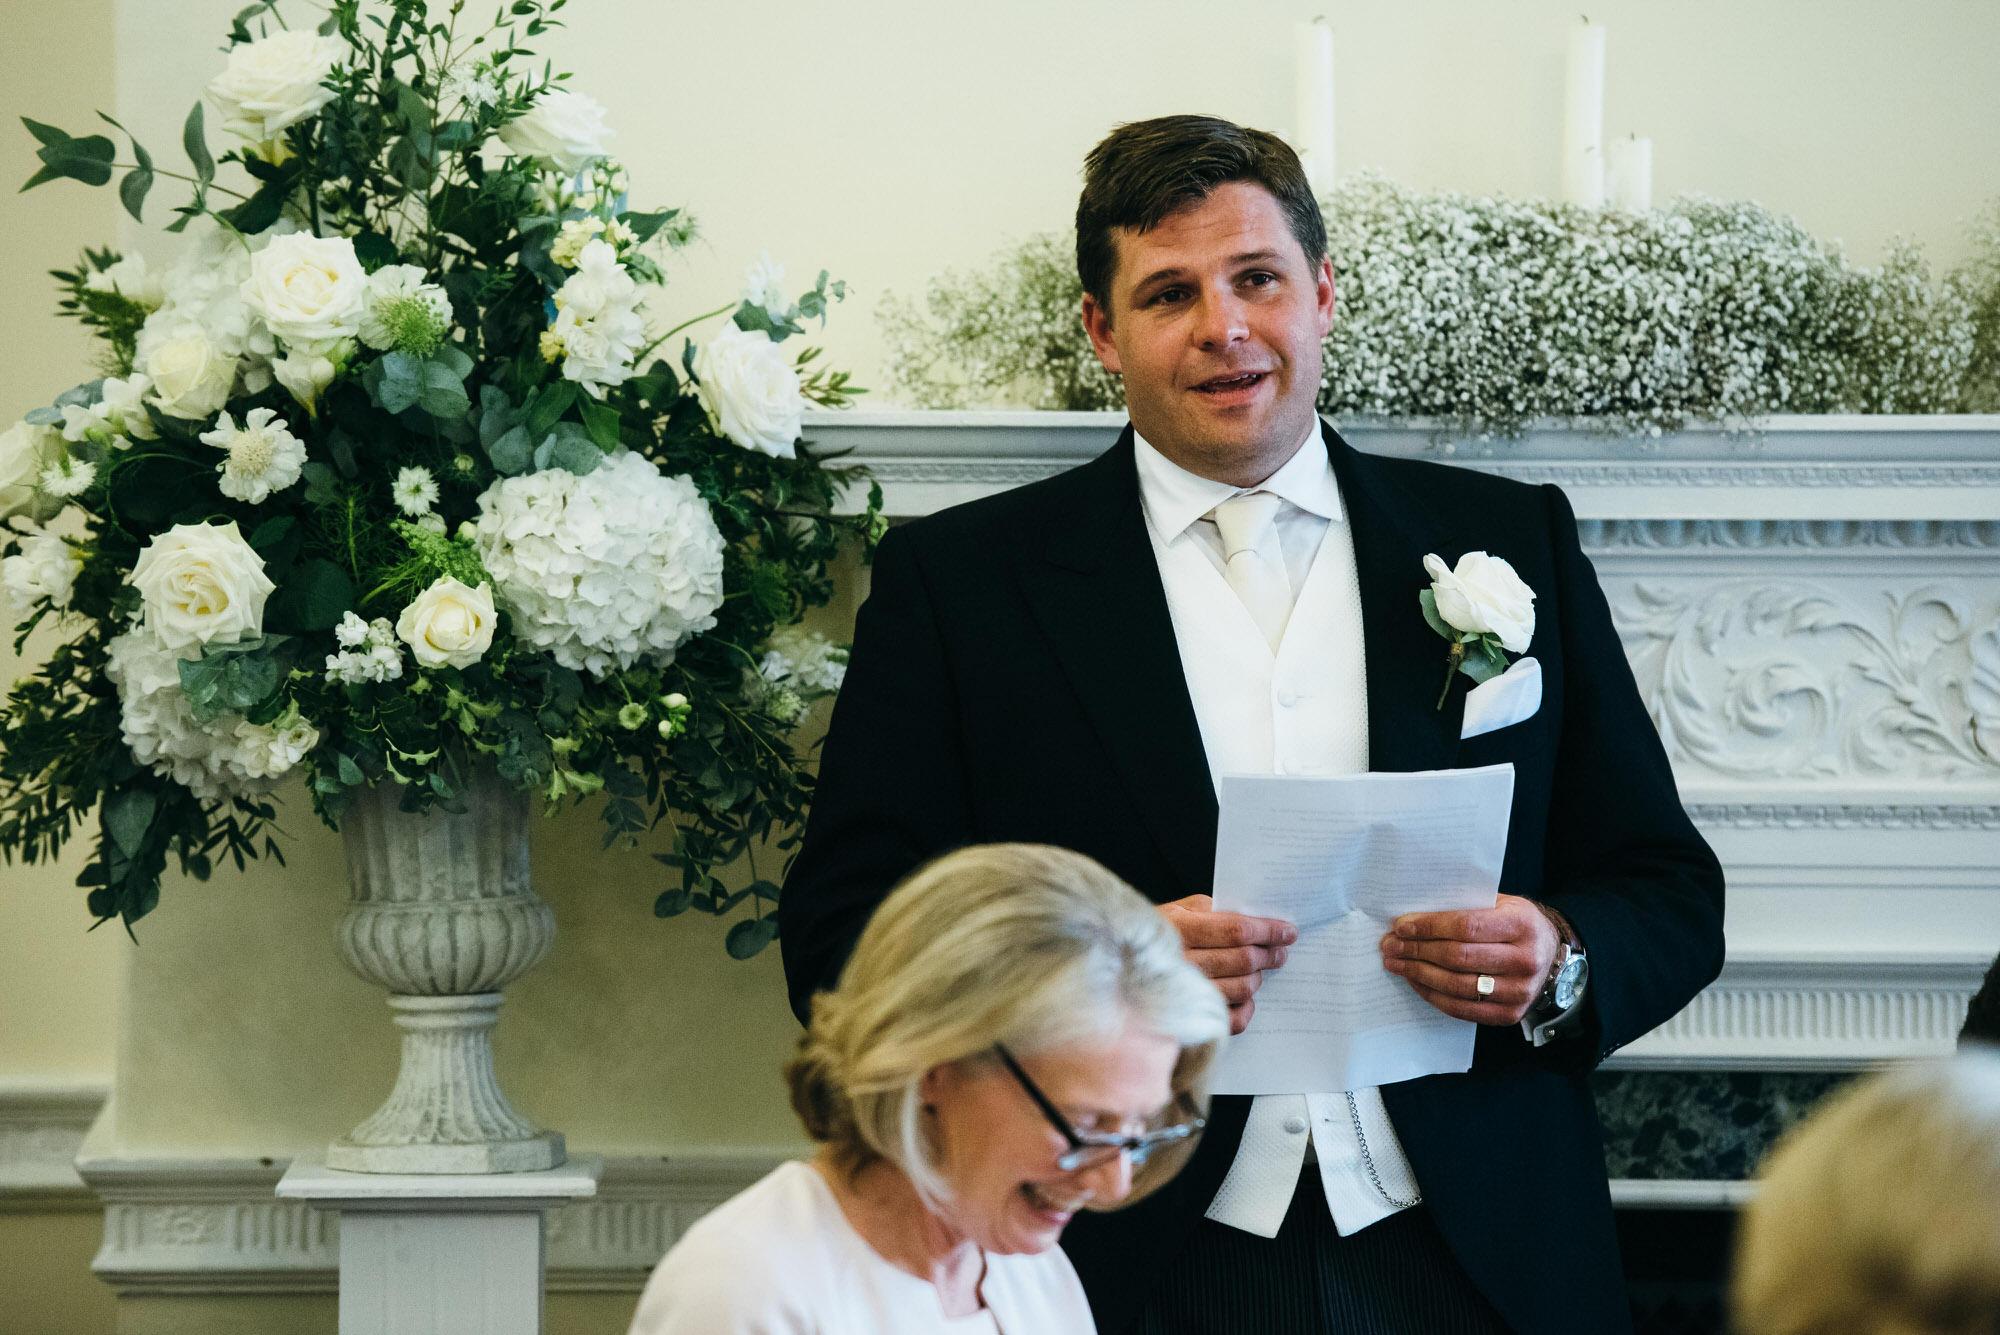 Kingswood school wedding speeches